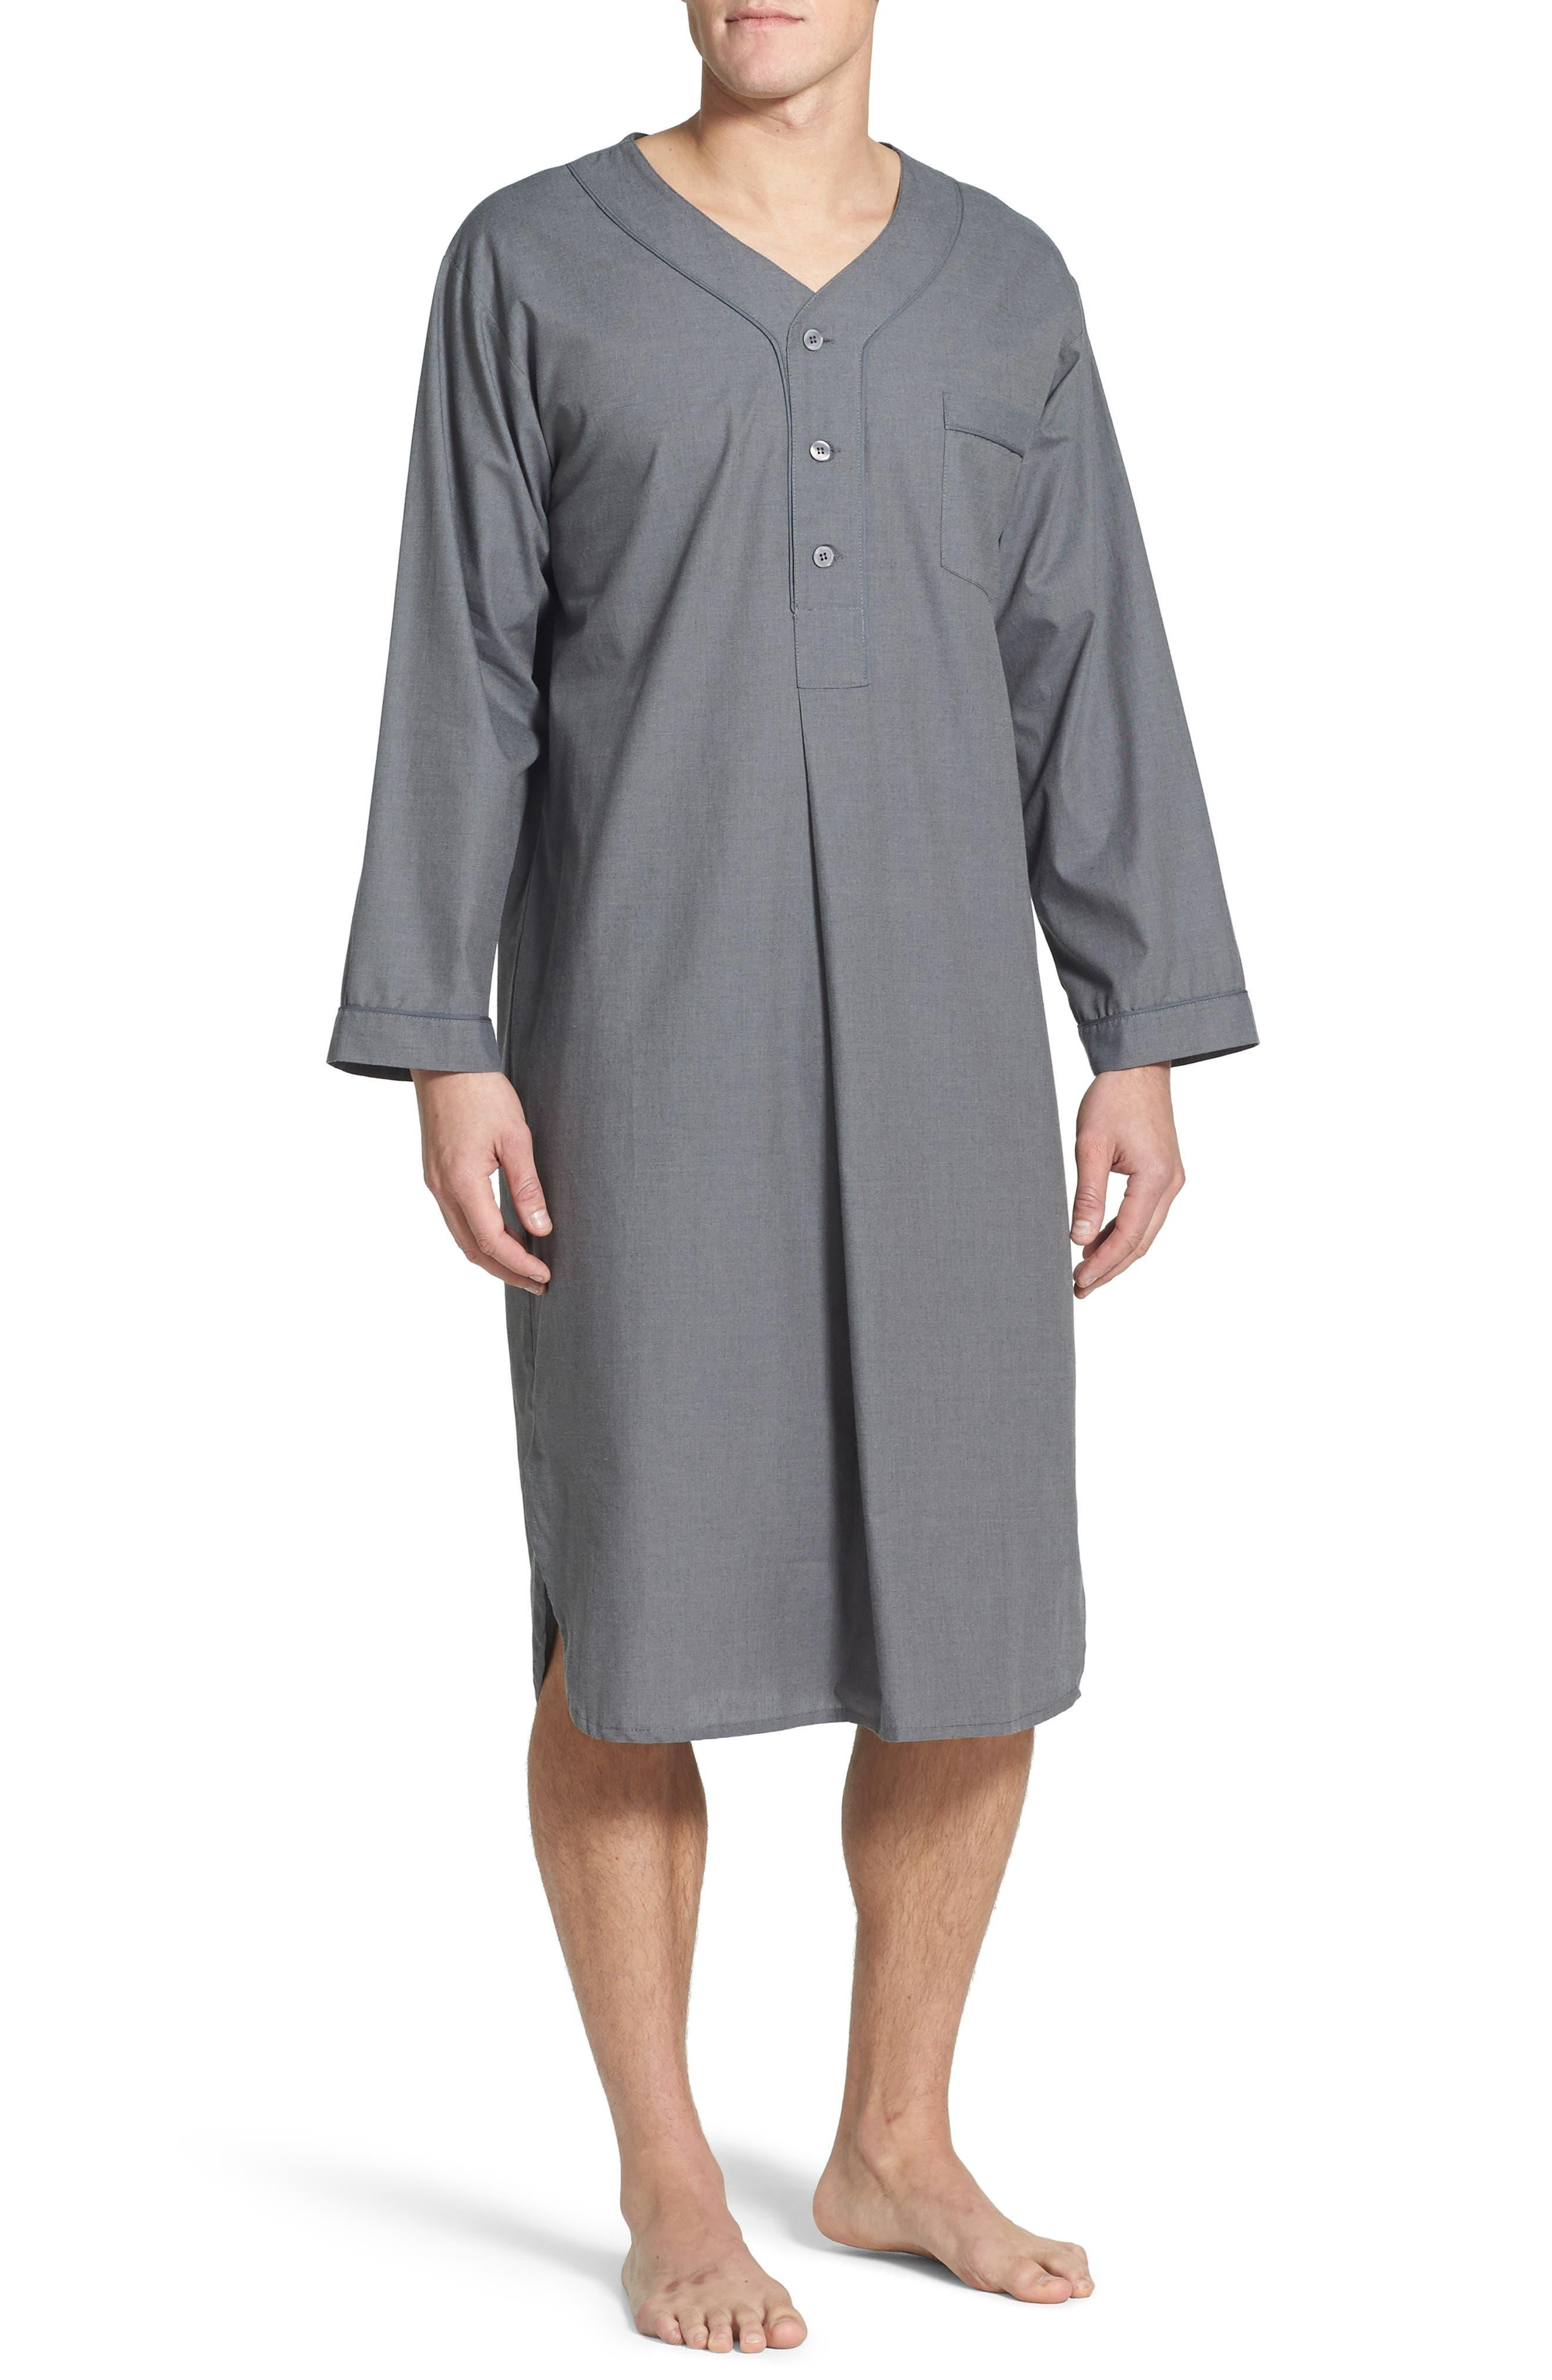 1940s Men's Underwear: Briefs, Boxers, Unions, & Socks Mens Majestic International Cotton Nightshirt Size SmallMedium - Grey $60.00 AT vintagedancer.com